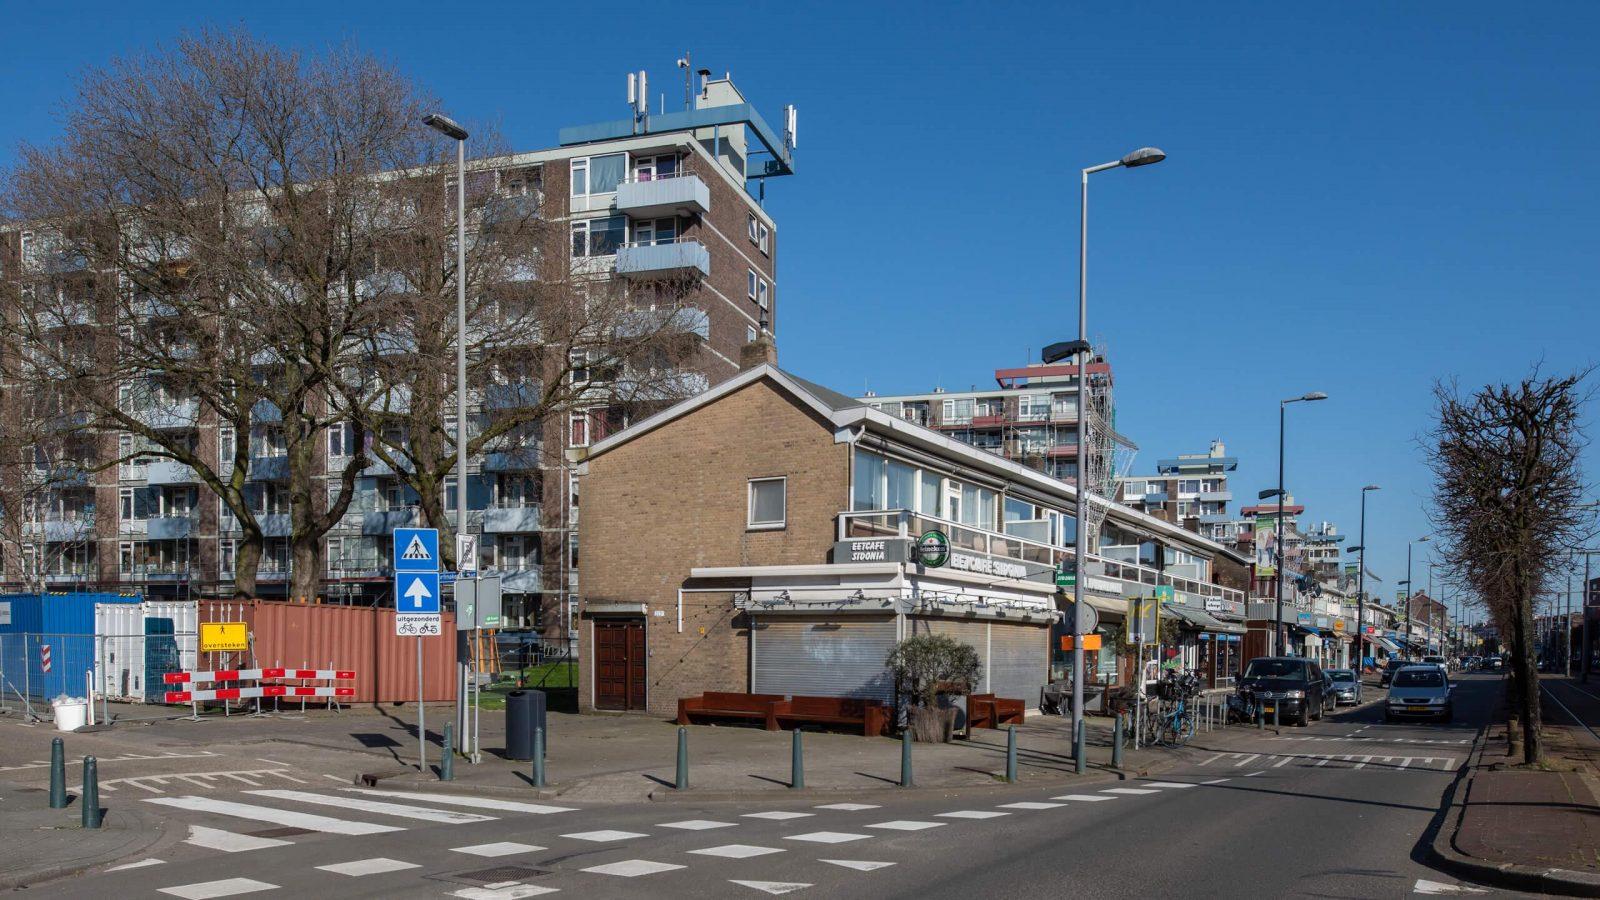 2021 Marlies Lageweg SPWR gijsinglaan schiedamseweg